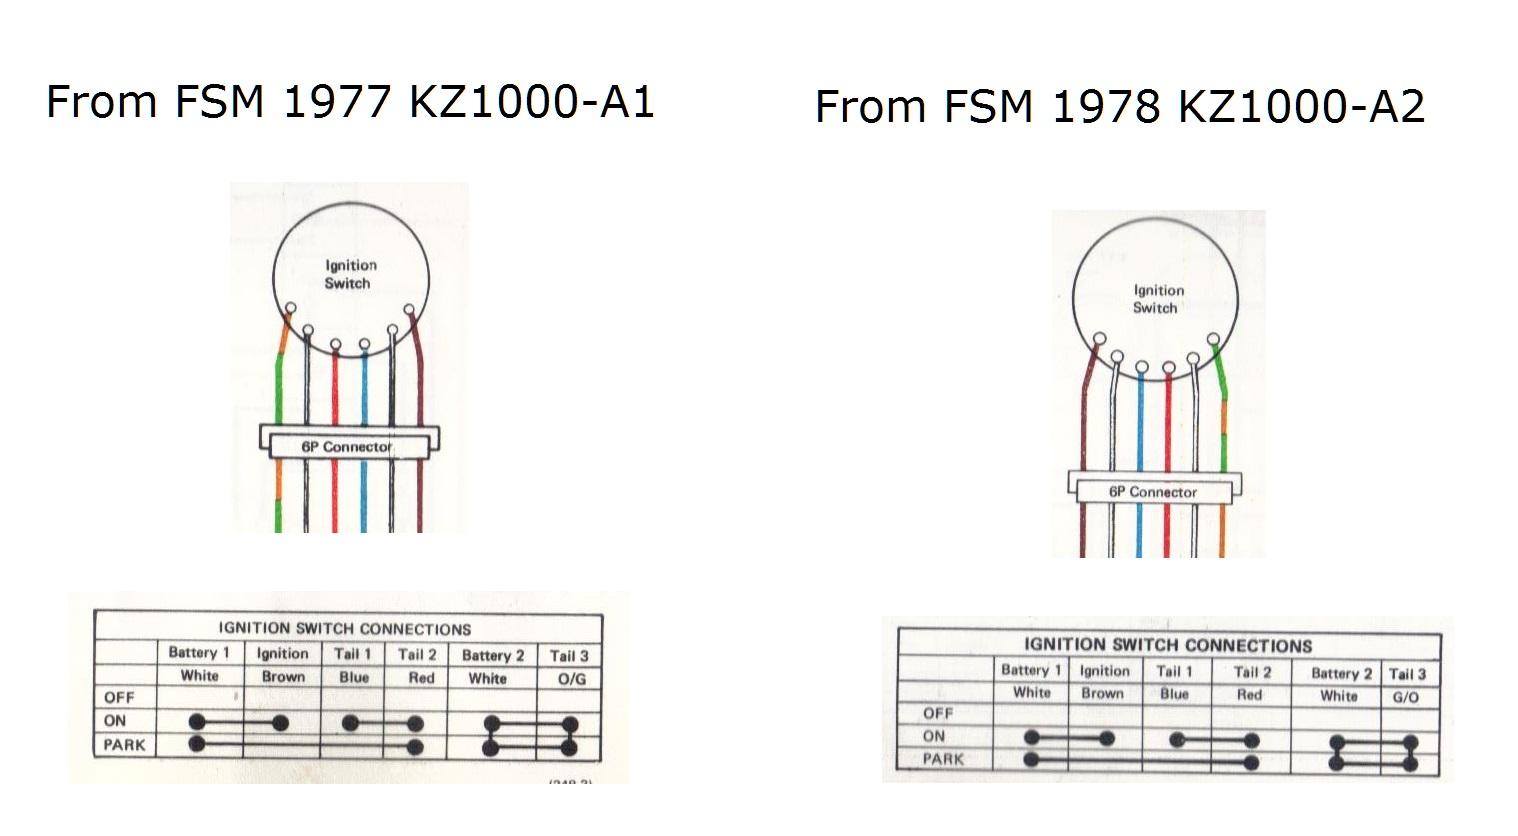 wiring diagram for 1983 kawasaki 750 ltd volvo fh12 wiring